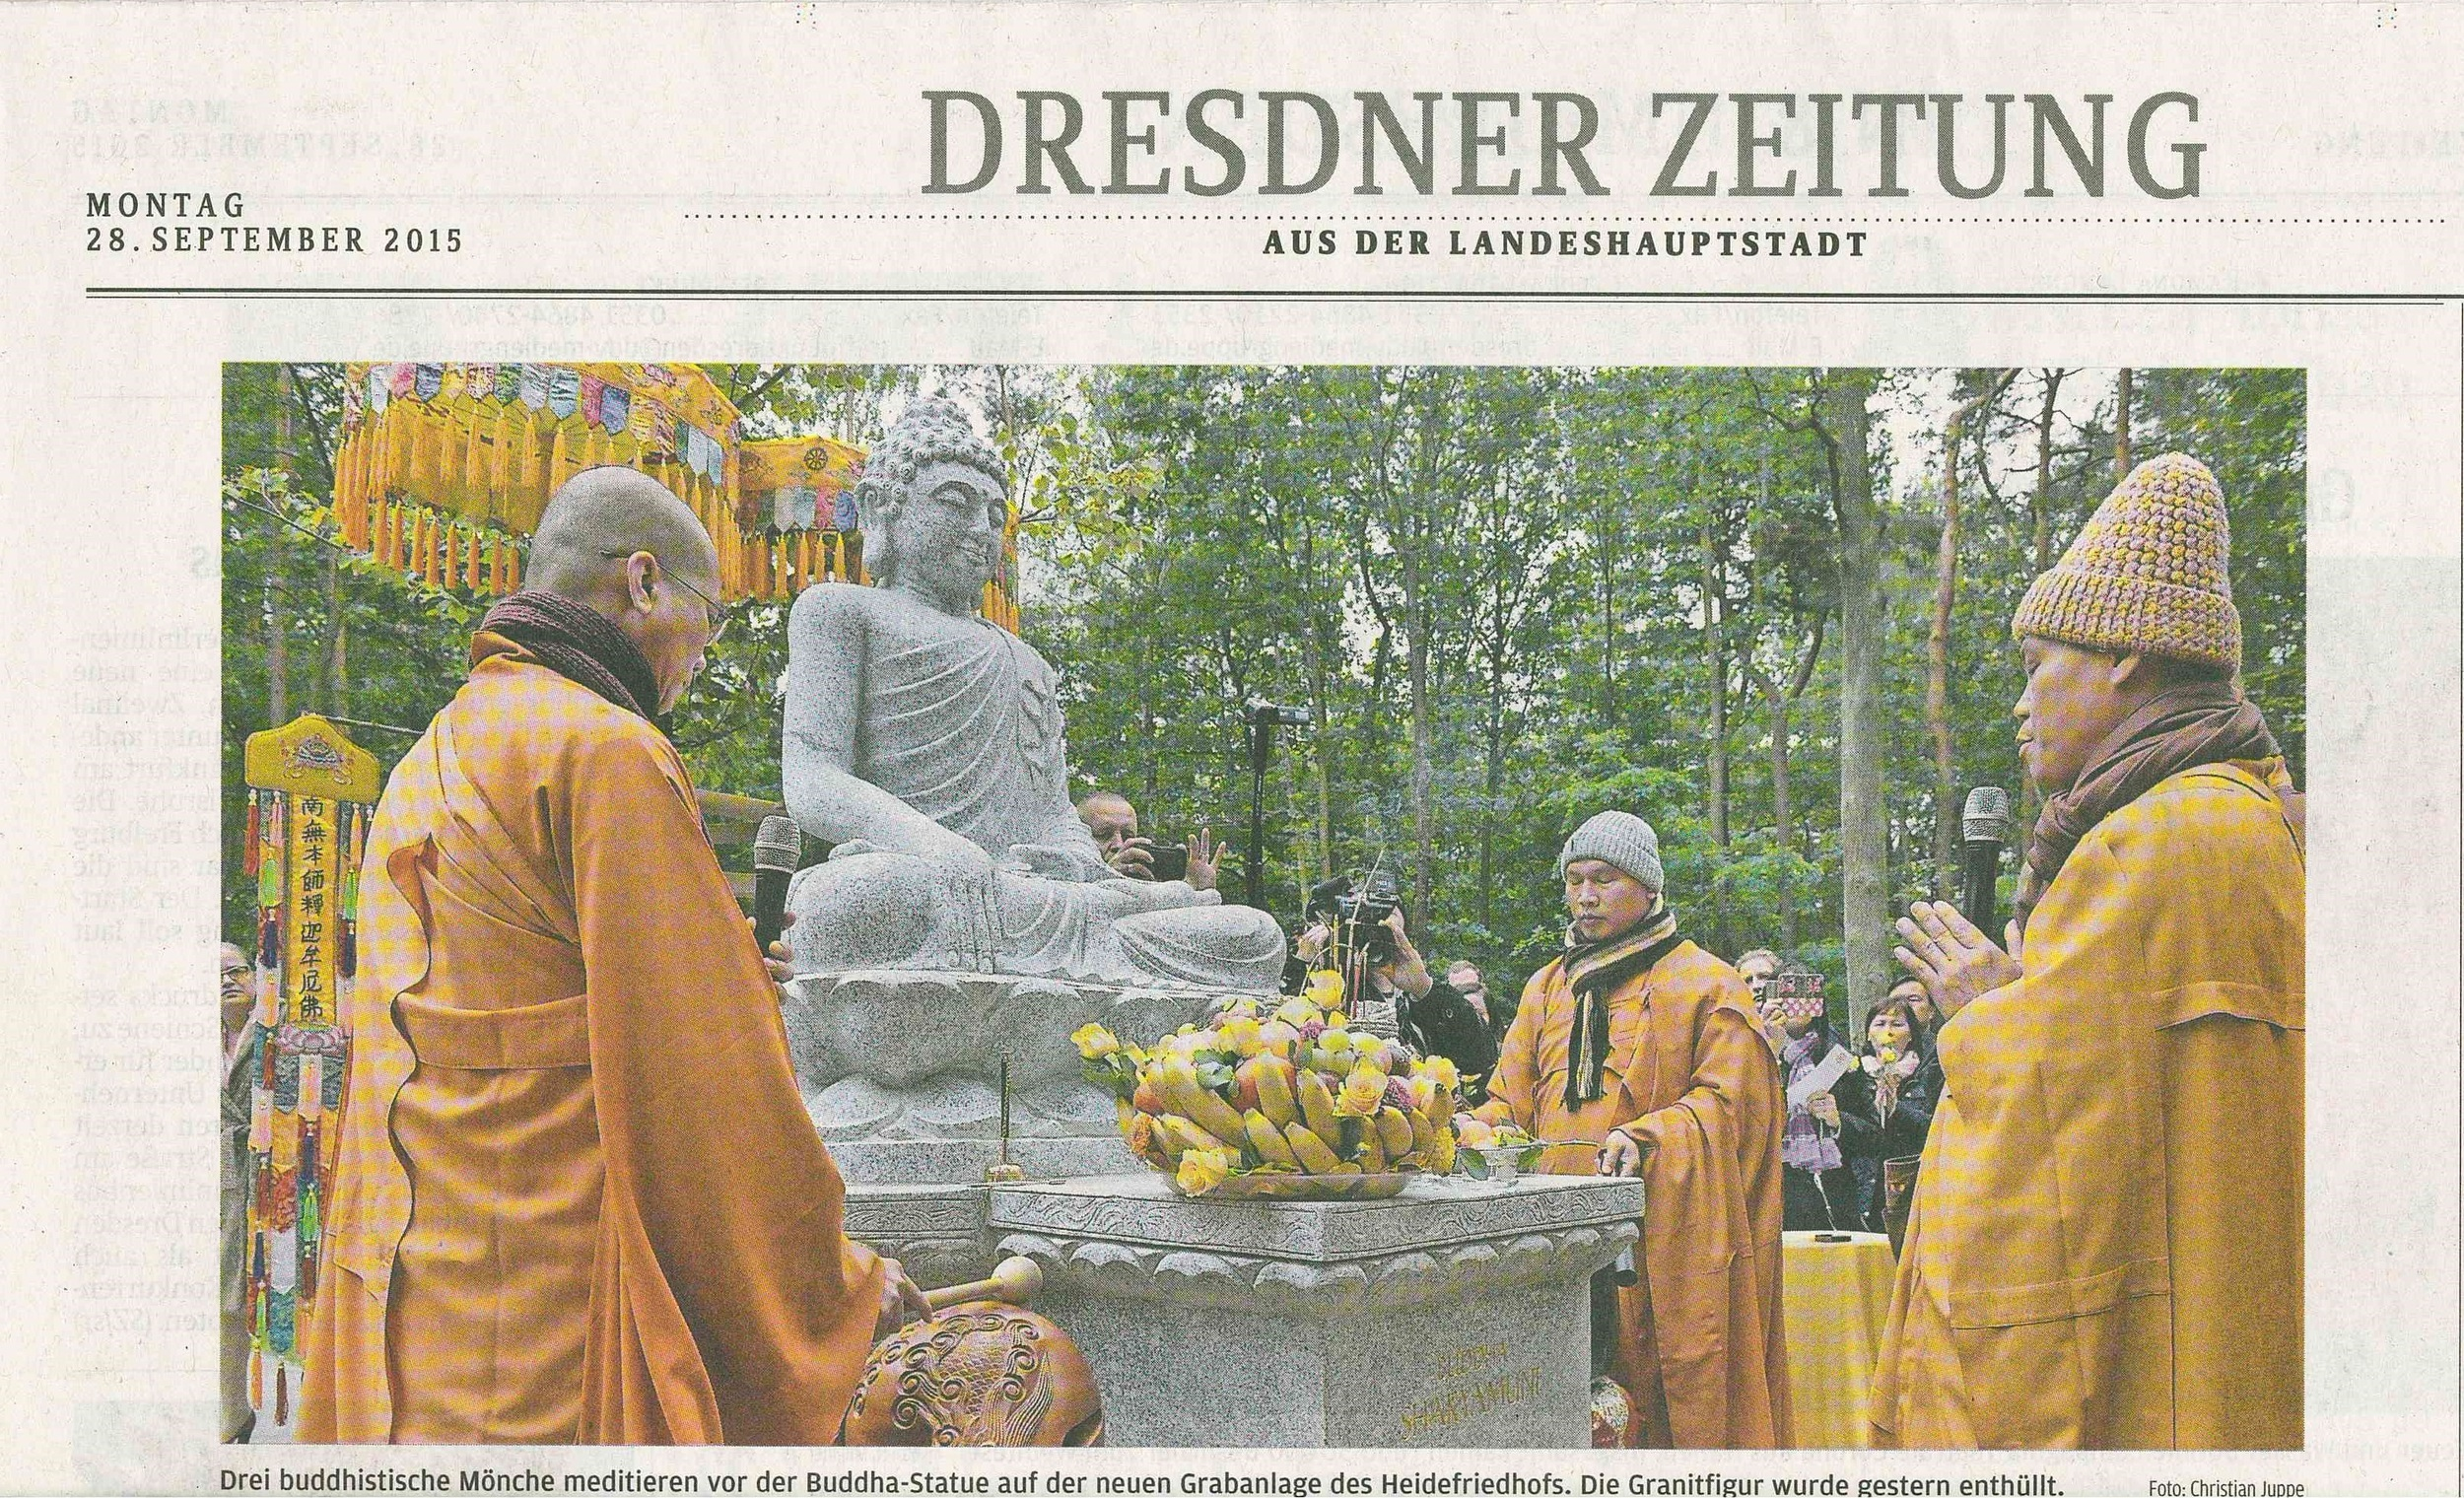 Dresdner Zeitung1 280915 .jpg